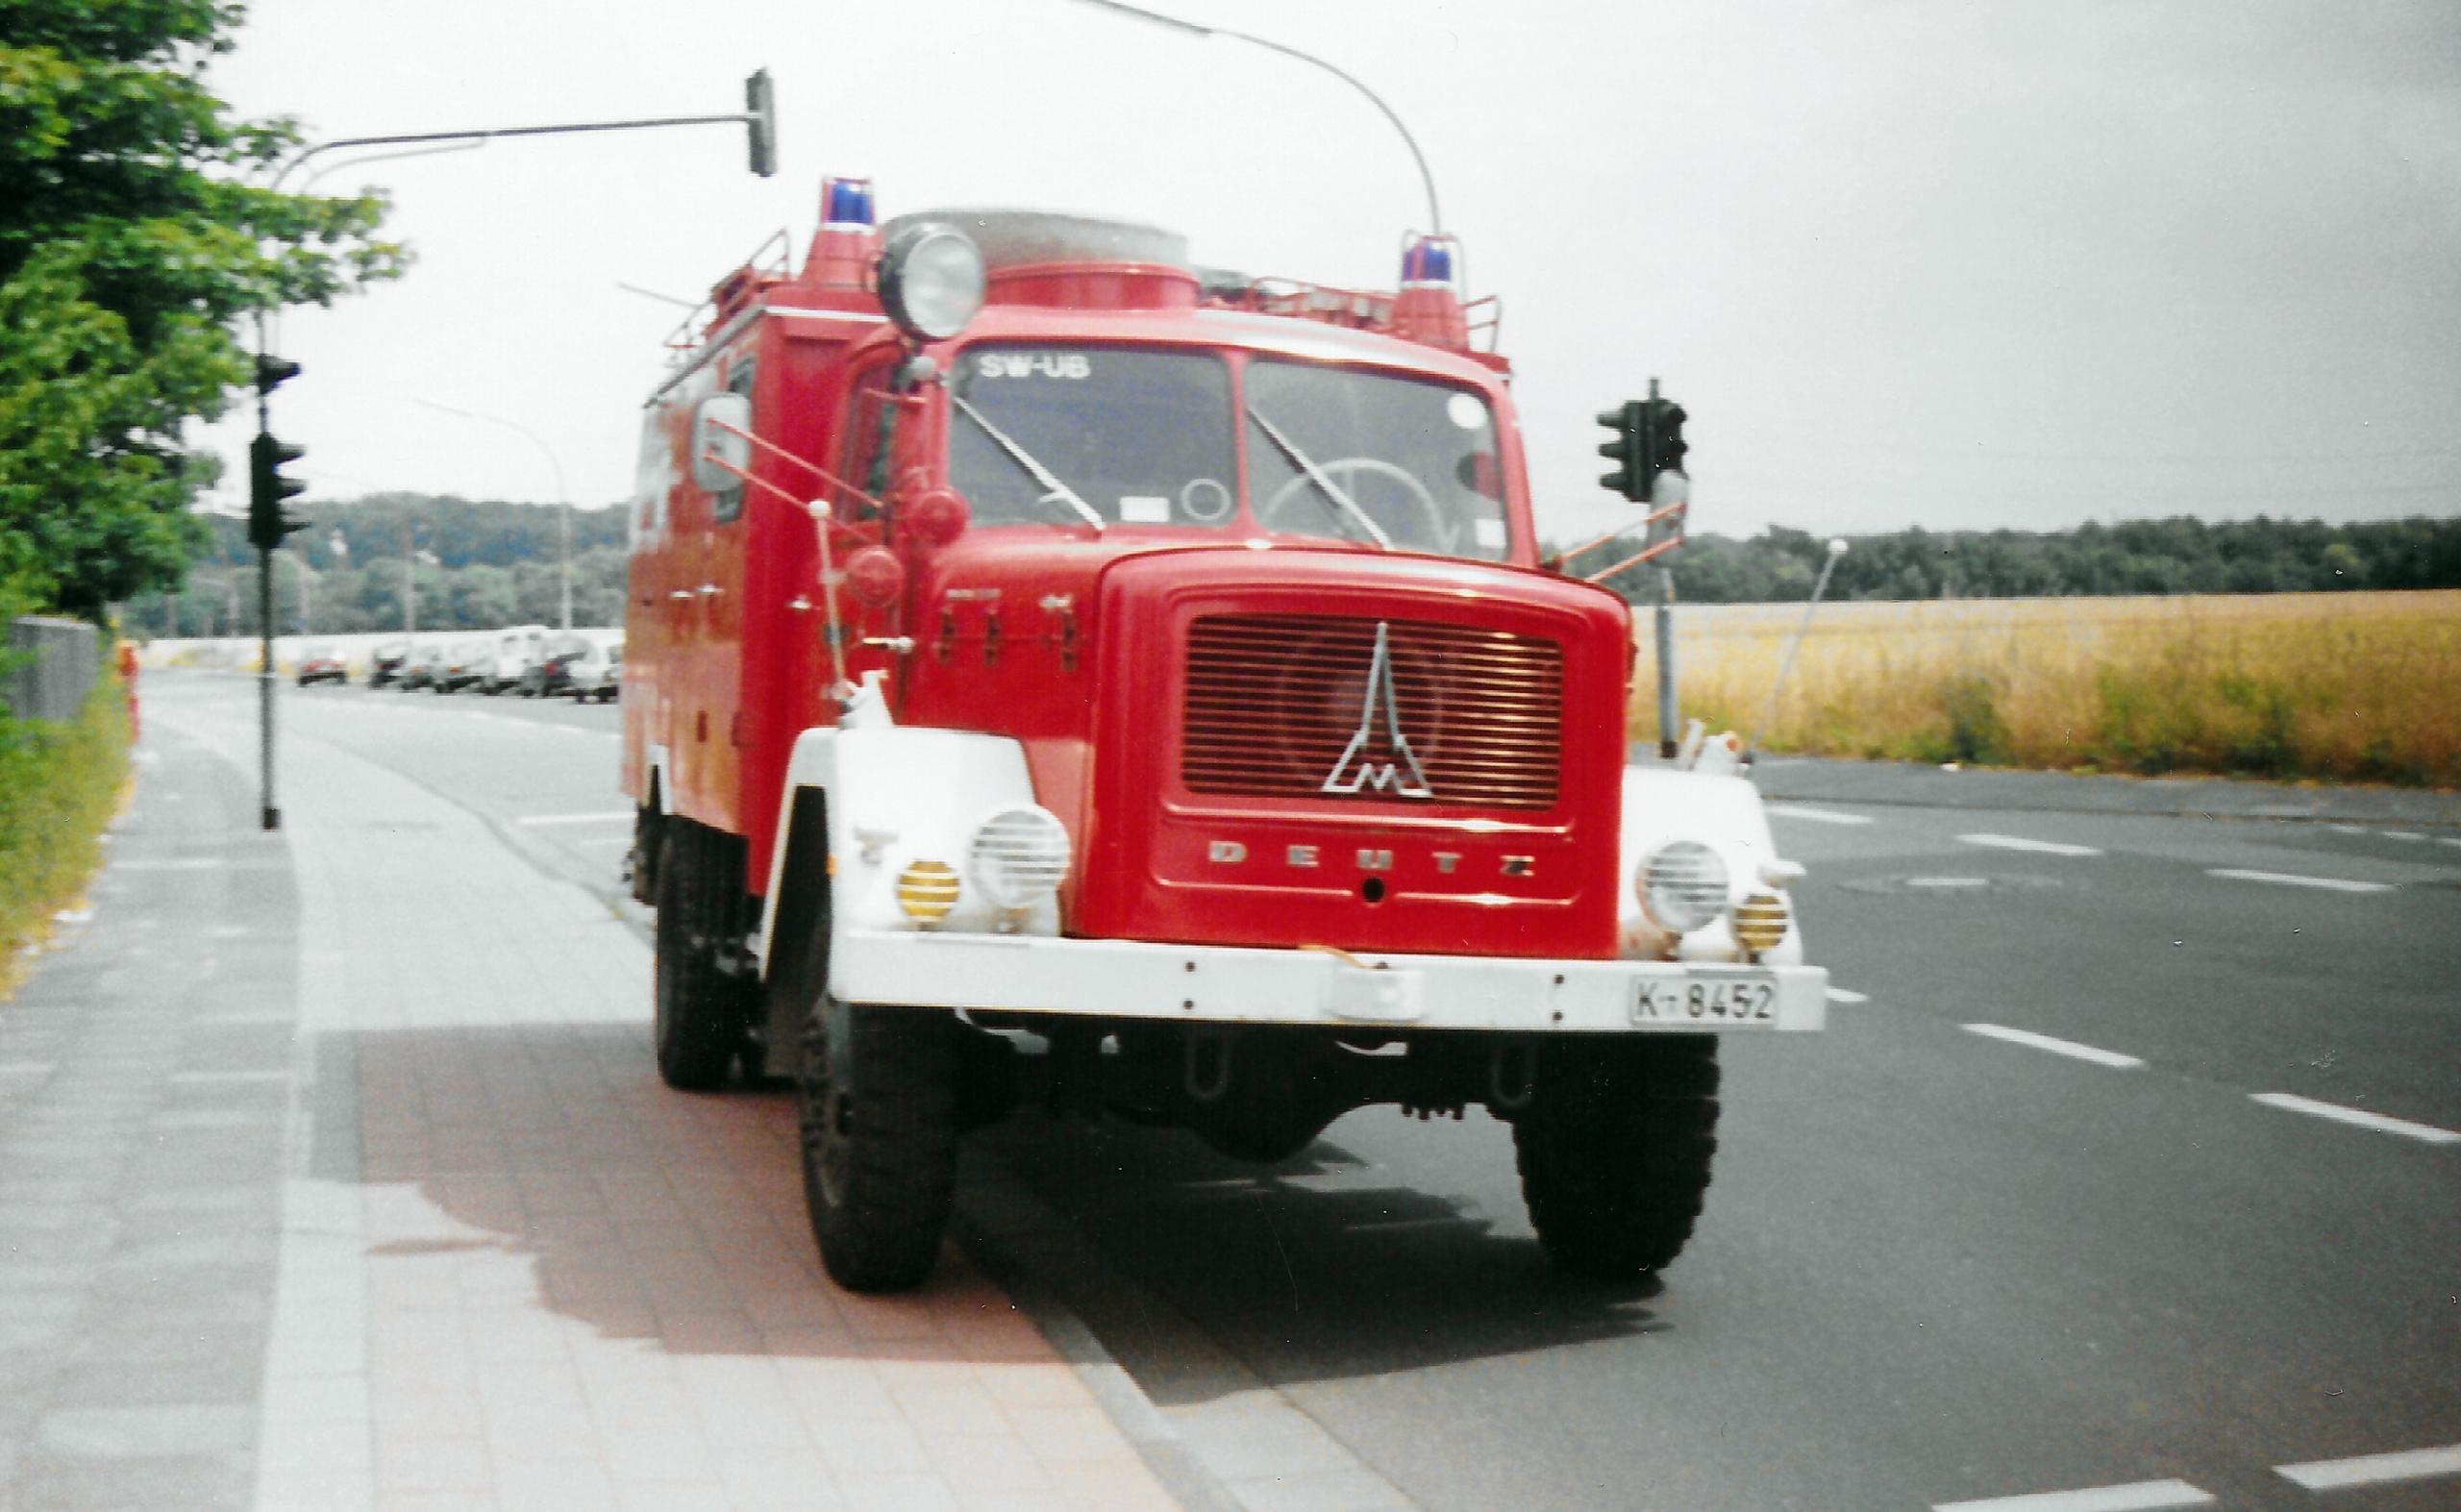 K-8452, SW-PL, BJ 1968, Magirus/Bauer